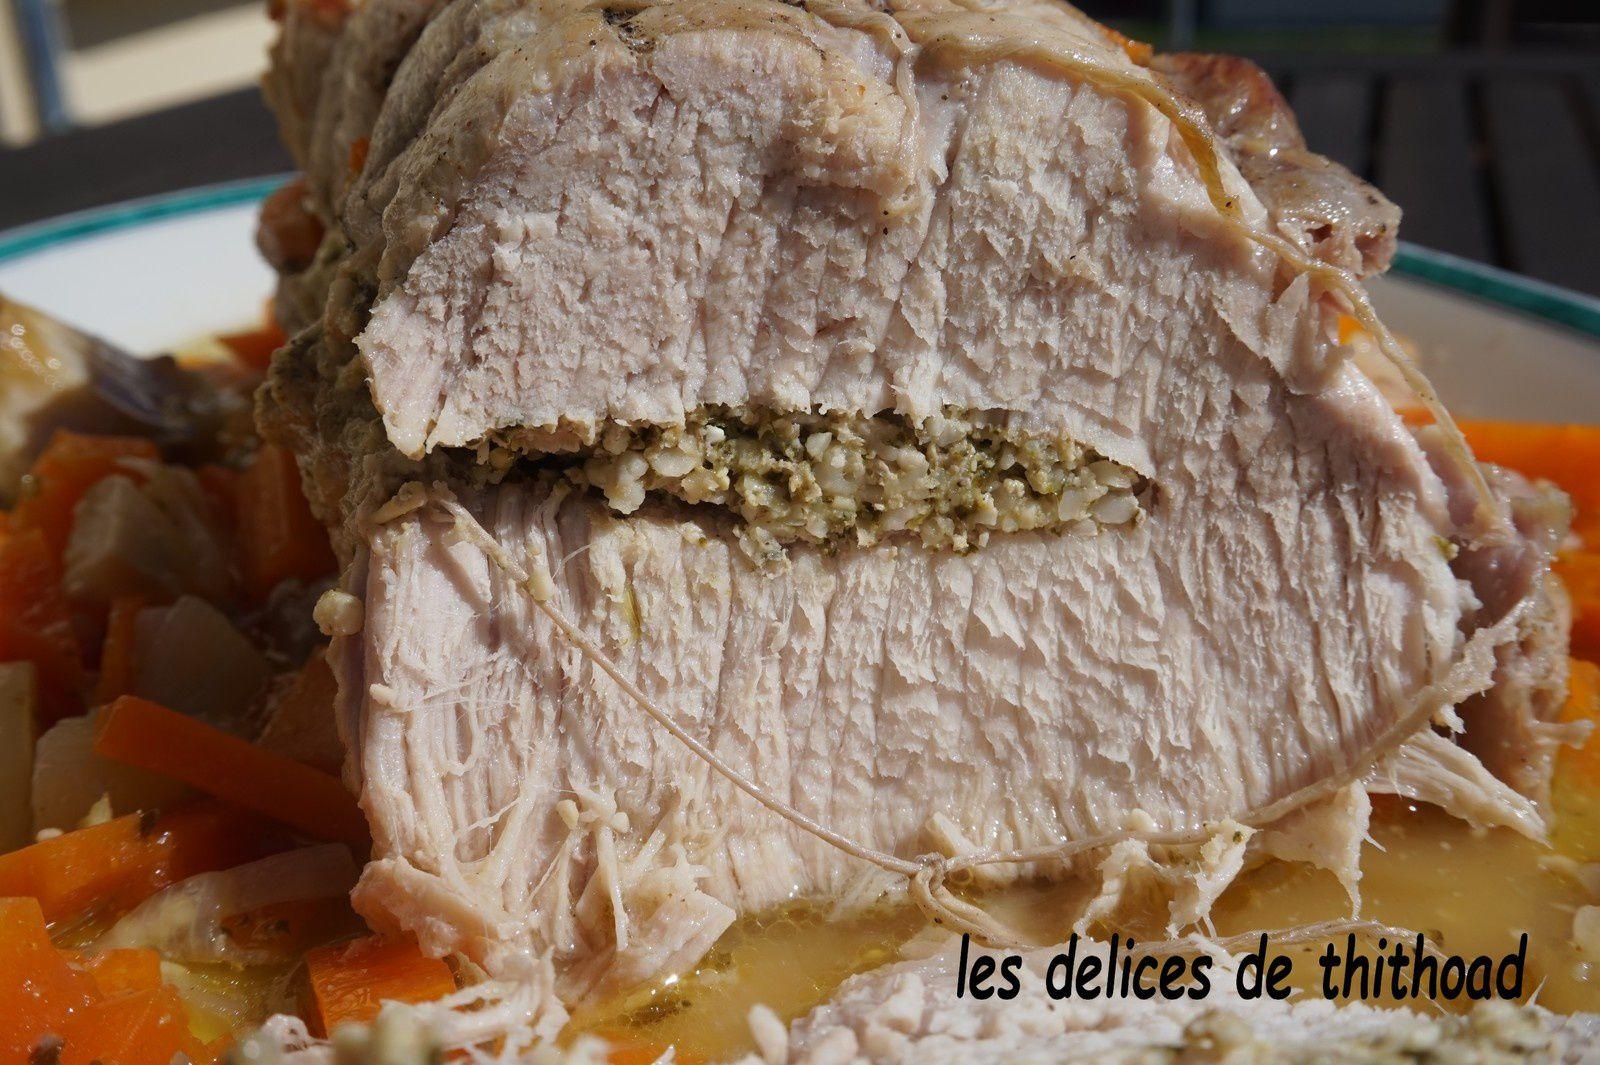 filet de porc farci au pesto d'herbes